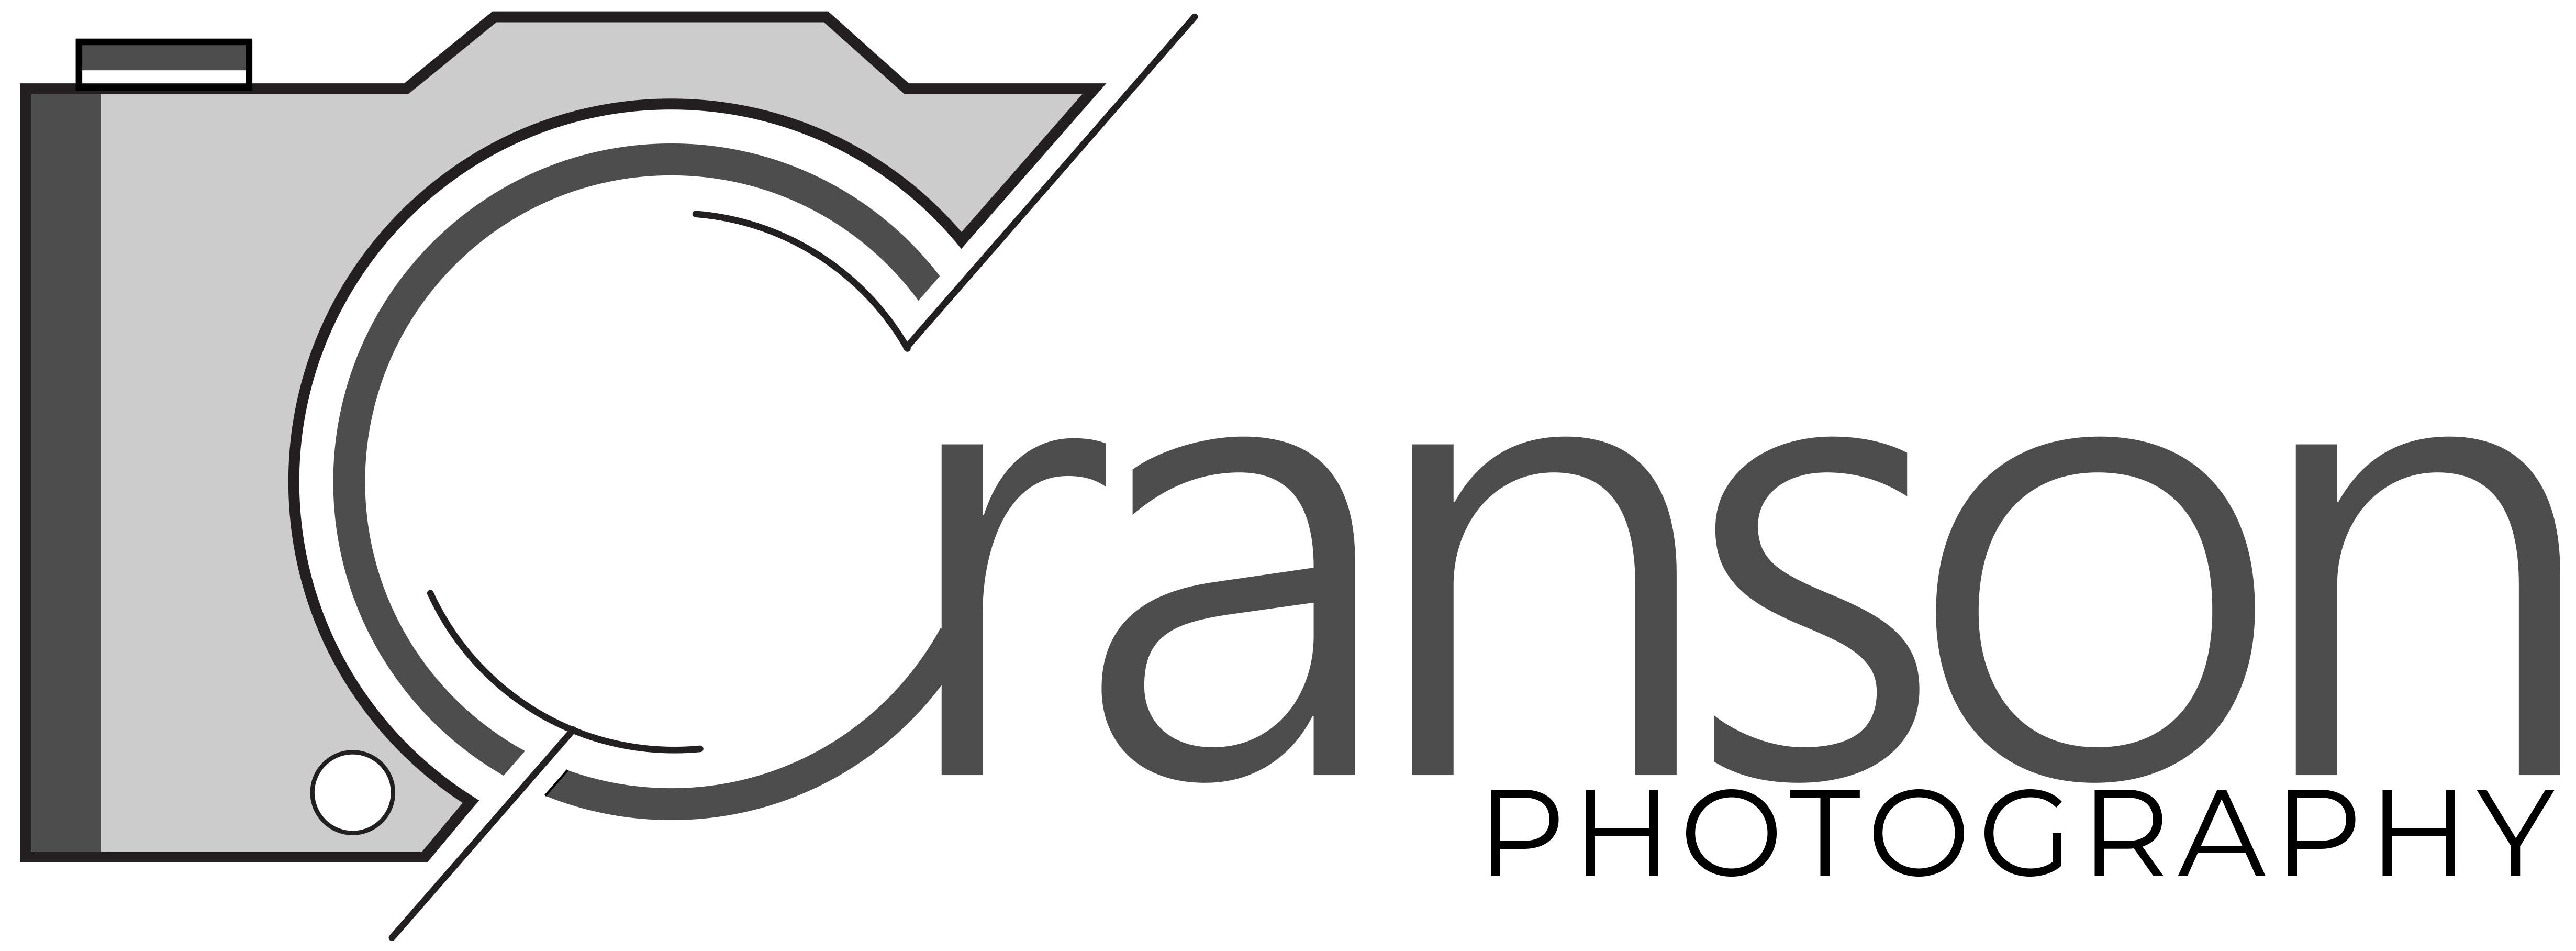 Cransons WordPress site